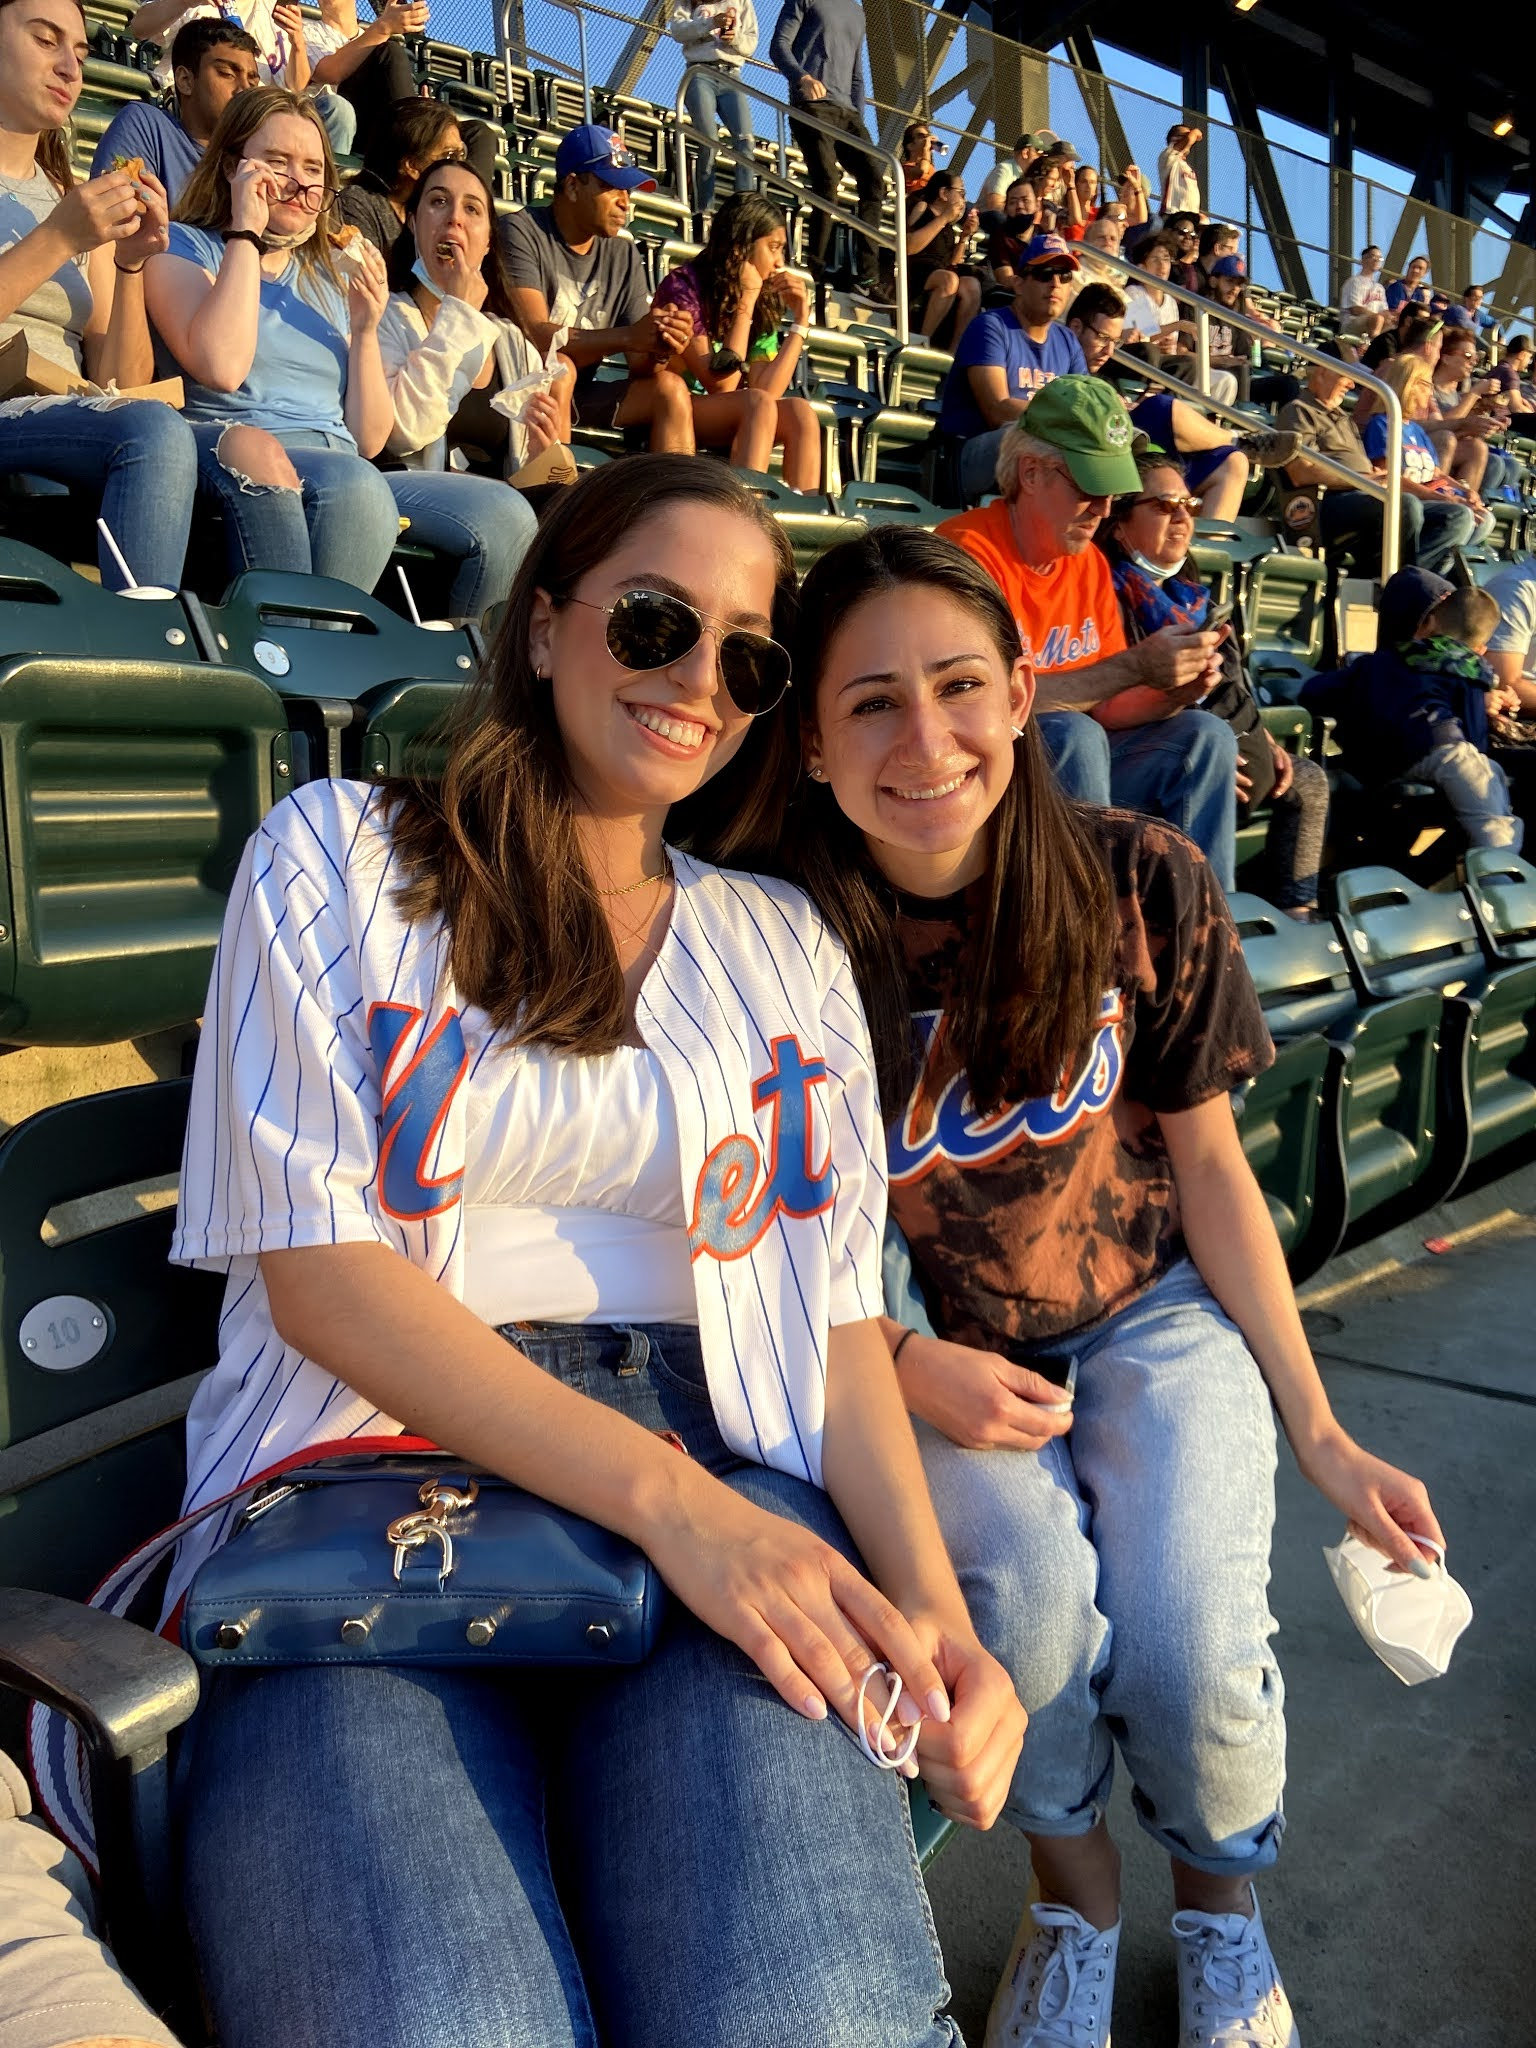 citi field, mets game, friends, new york, baseball game